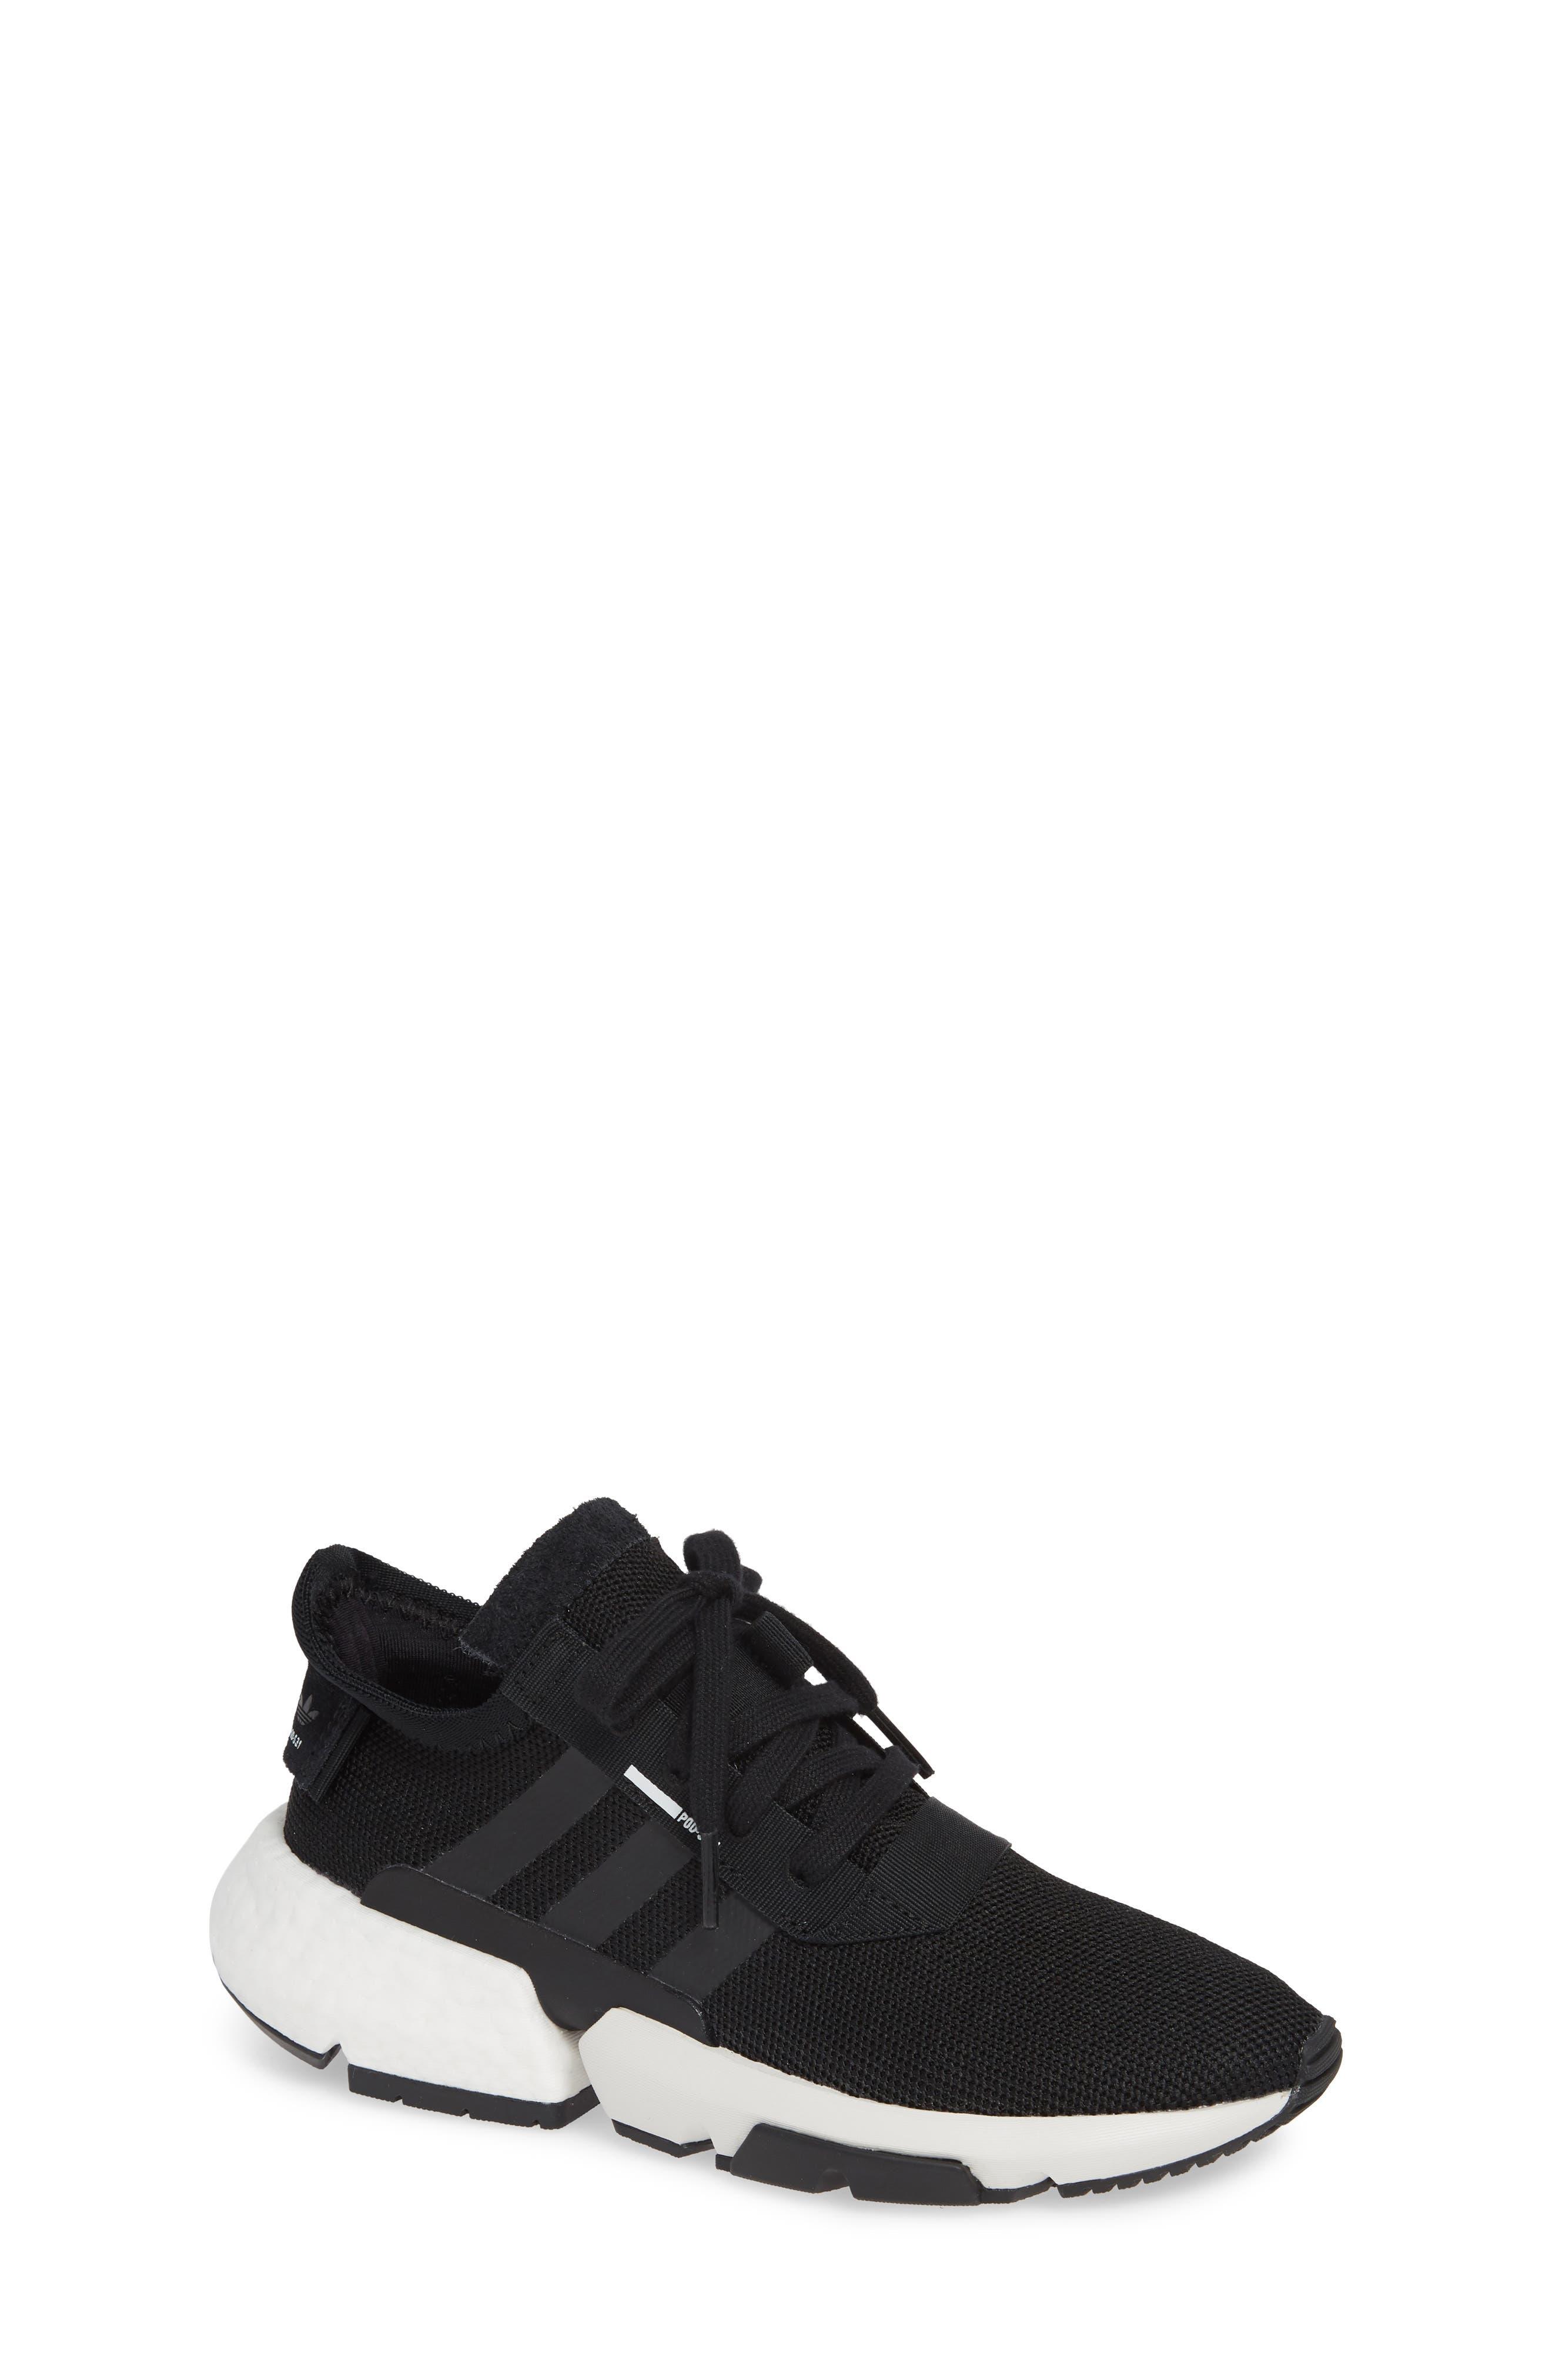 POD-S3.1 Sneaker,                             Main thumbnail 1, color,                             CORE BLACK/ BLACK/ LEGEND IVY